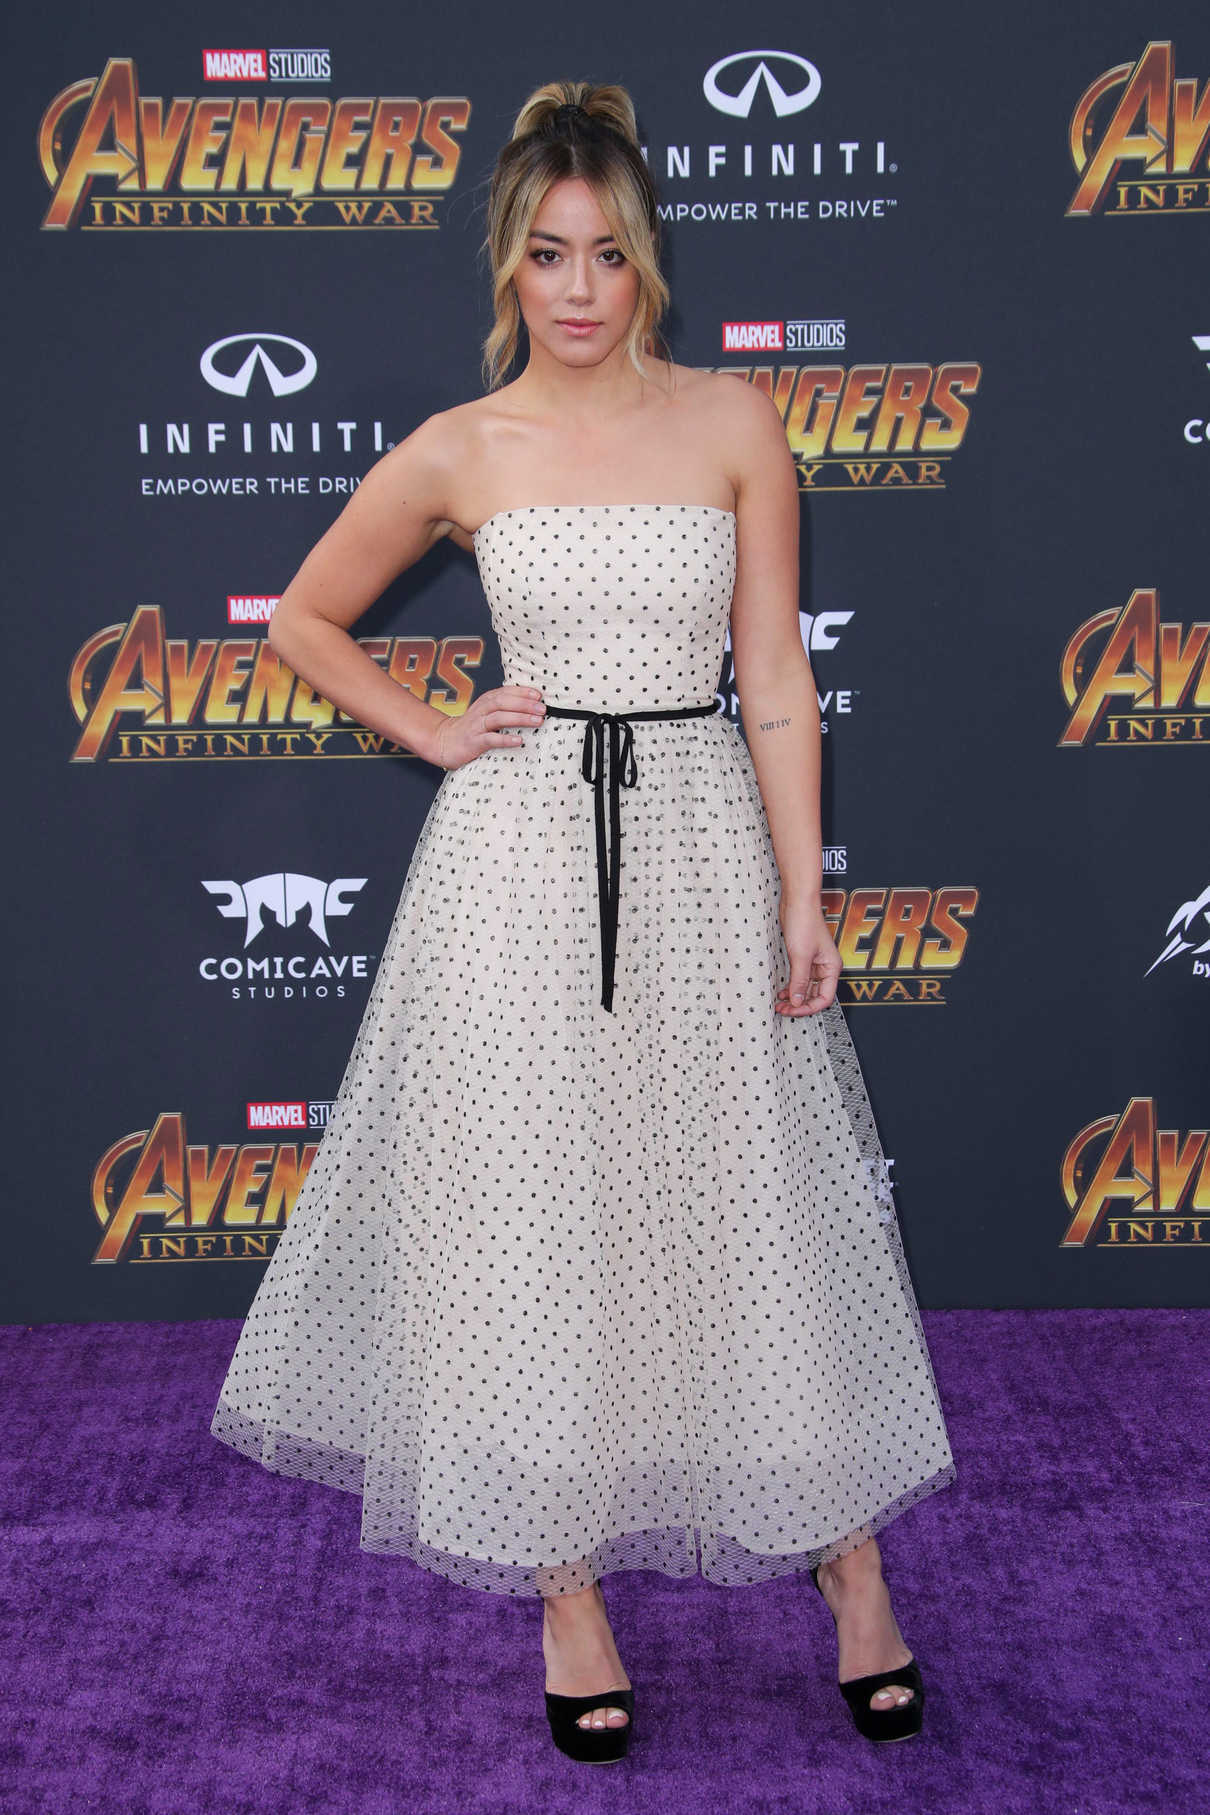 Chloe Bennet at Avengers: Infinity War Premiere in Los Angeles 04/23/2018-3